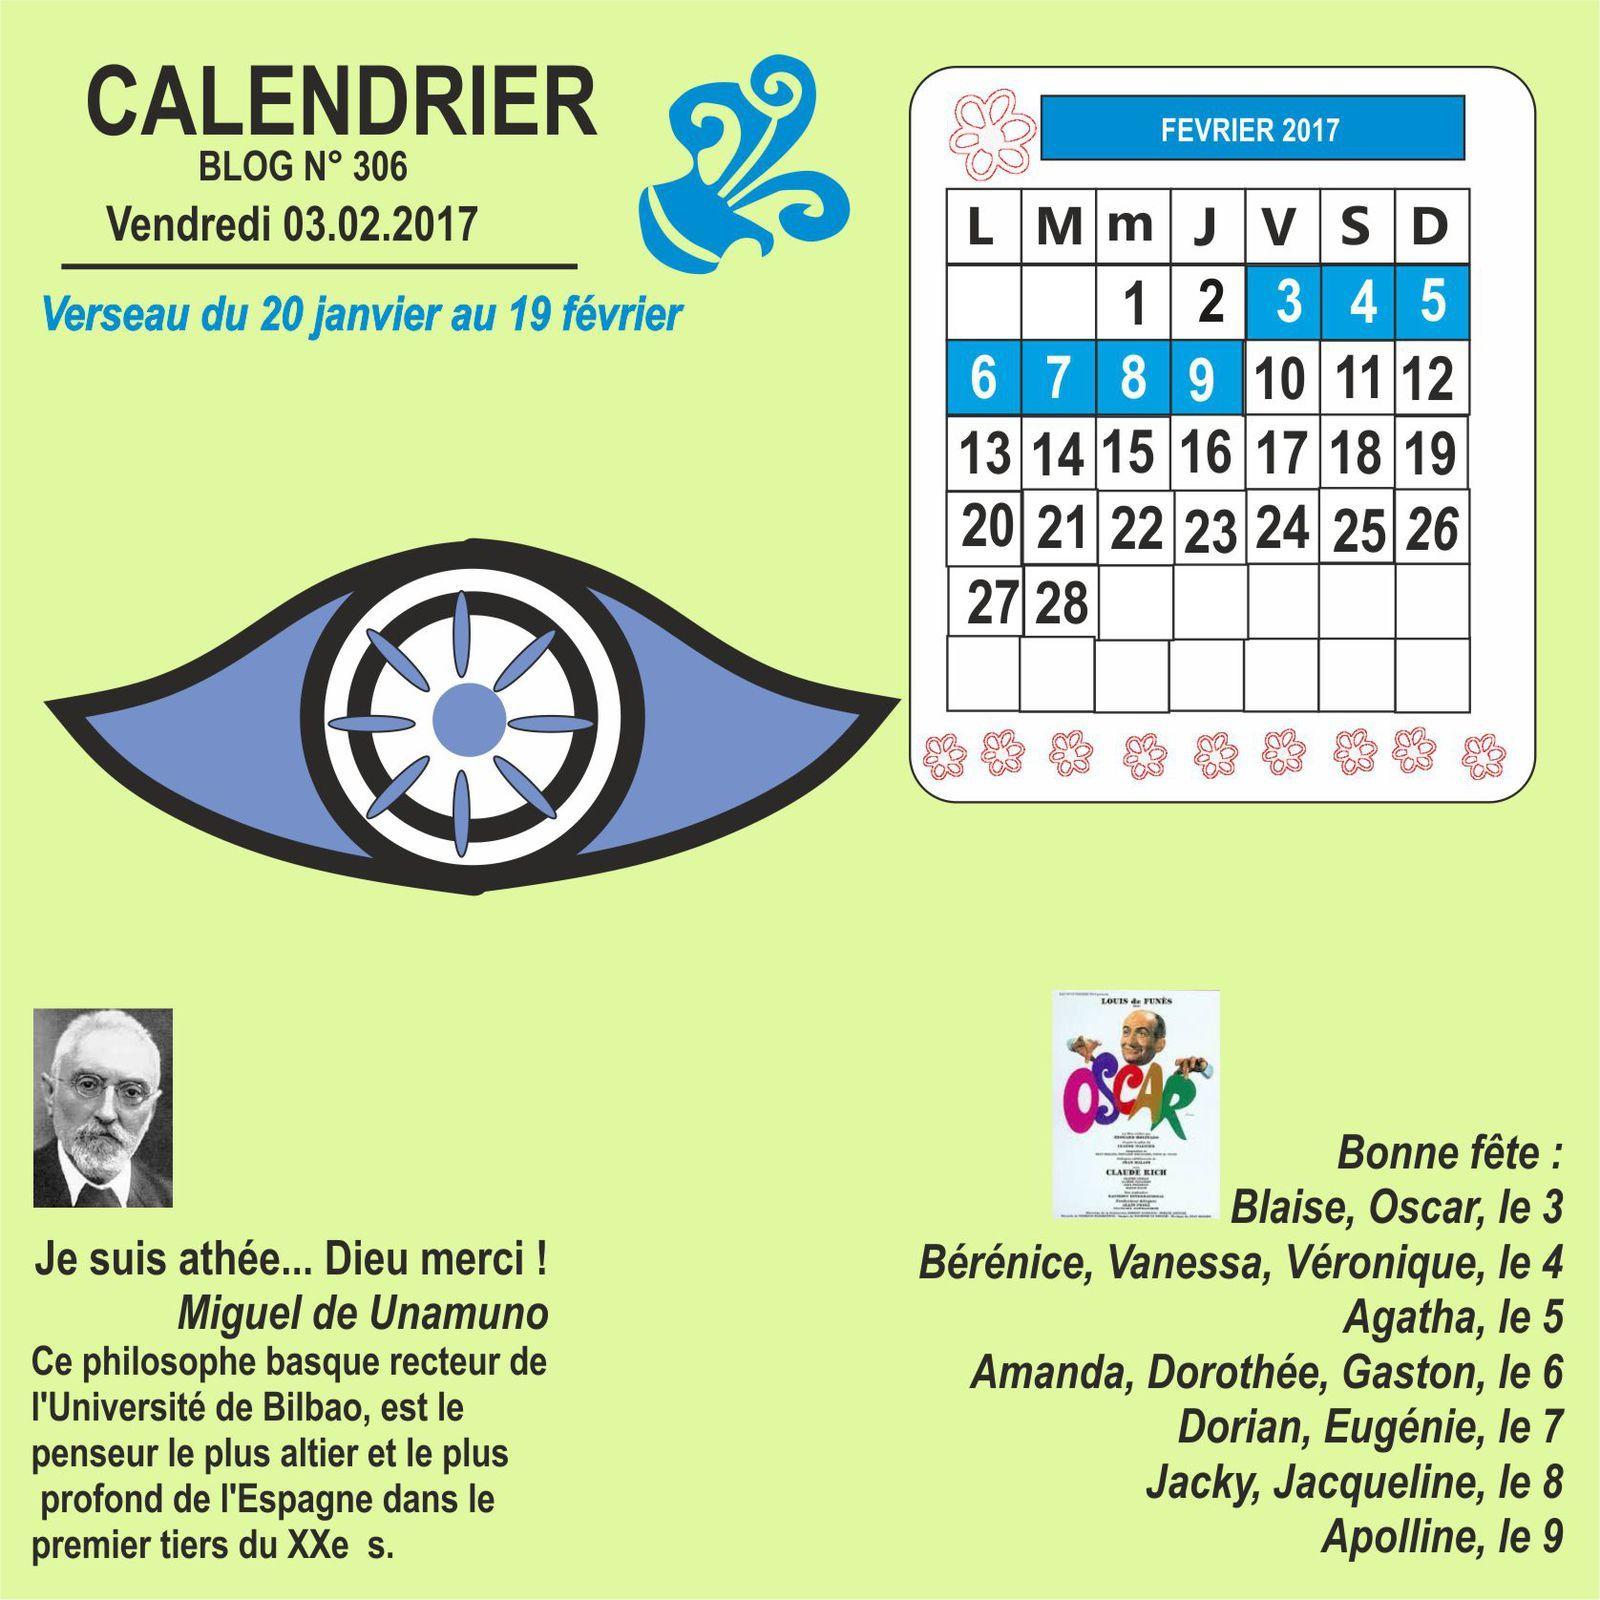 2 FEVRIER 2016 - INFOS DU CIQ